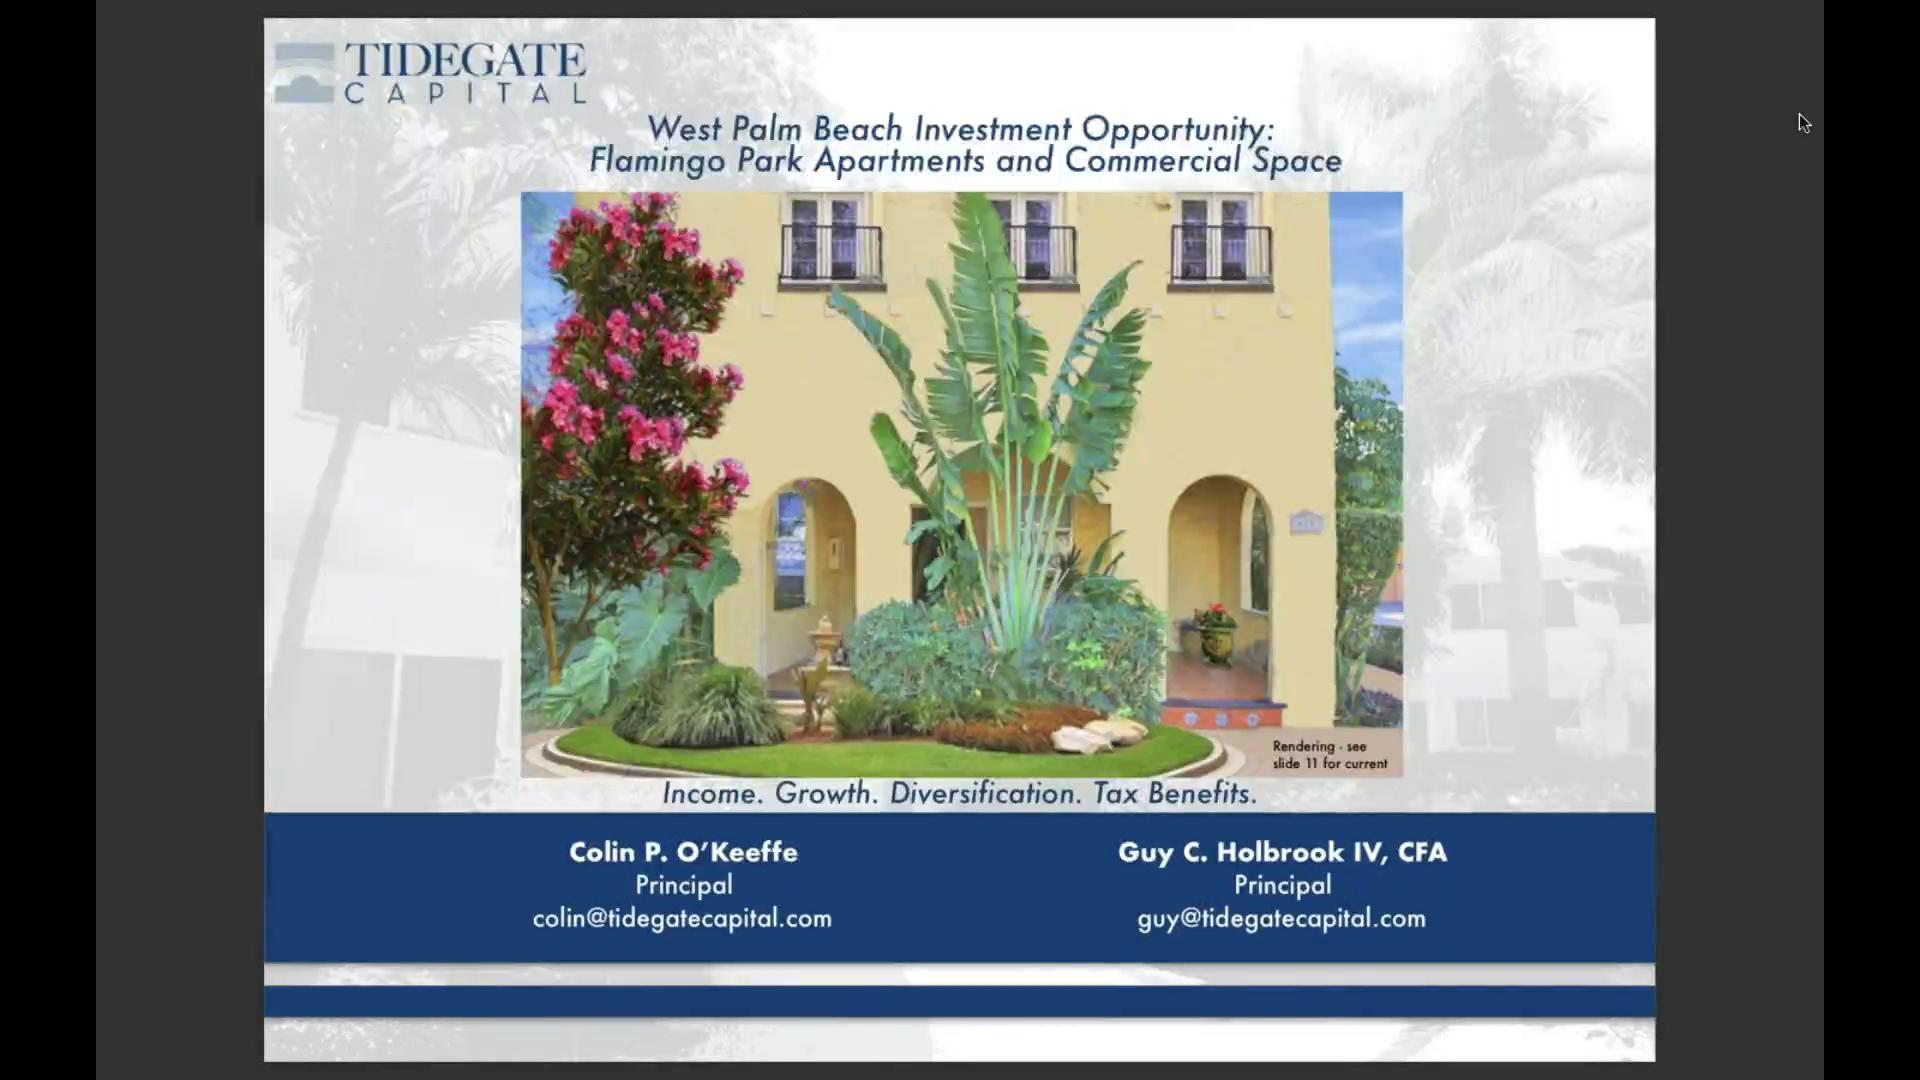 Investment Video - Flamingo Park Apartments